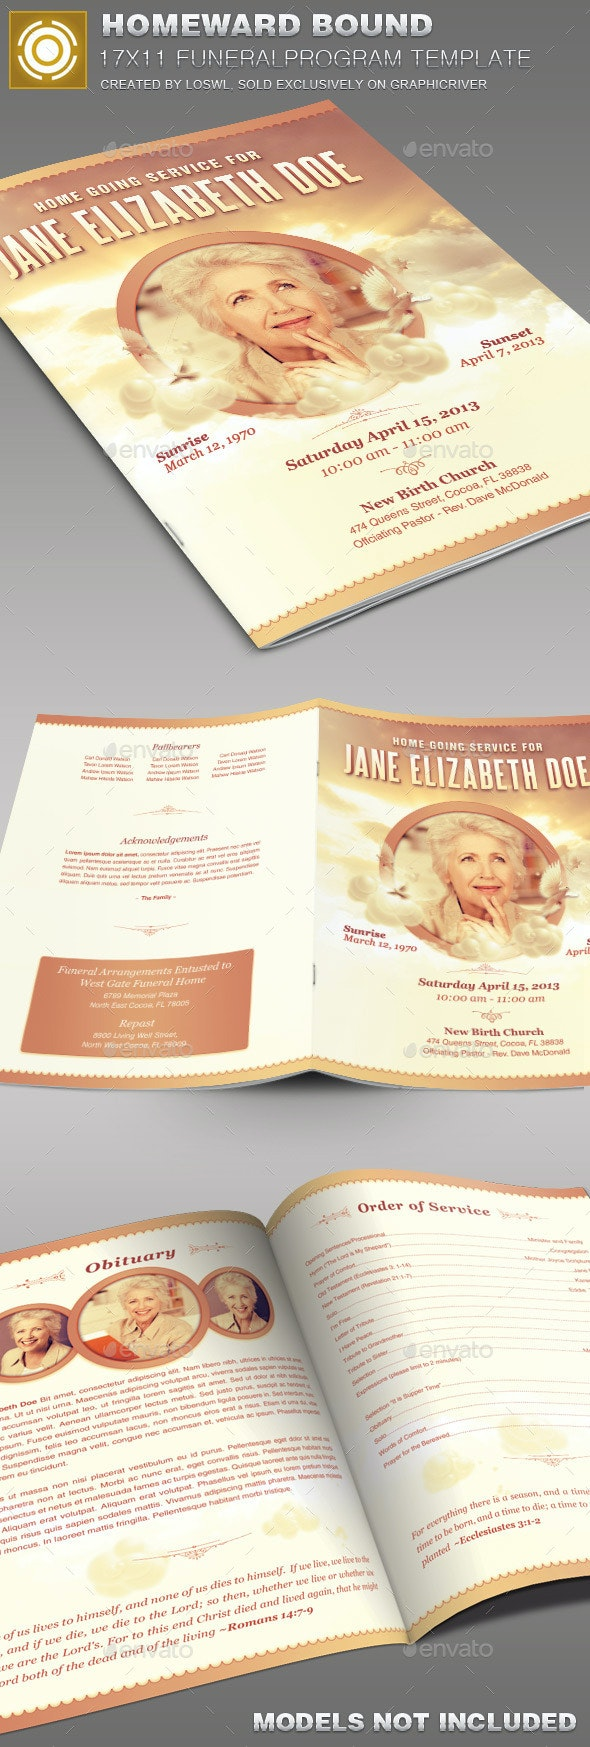 Homeward Bound Funeral Program Template 003 - Informational Brochures